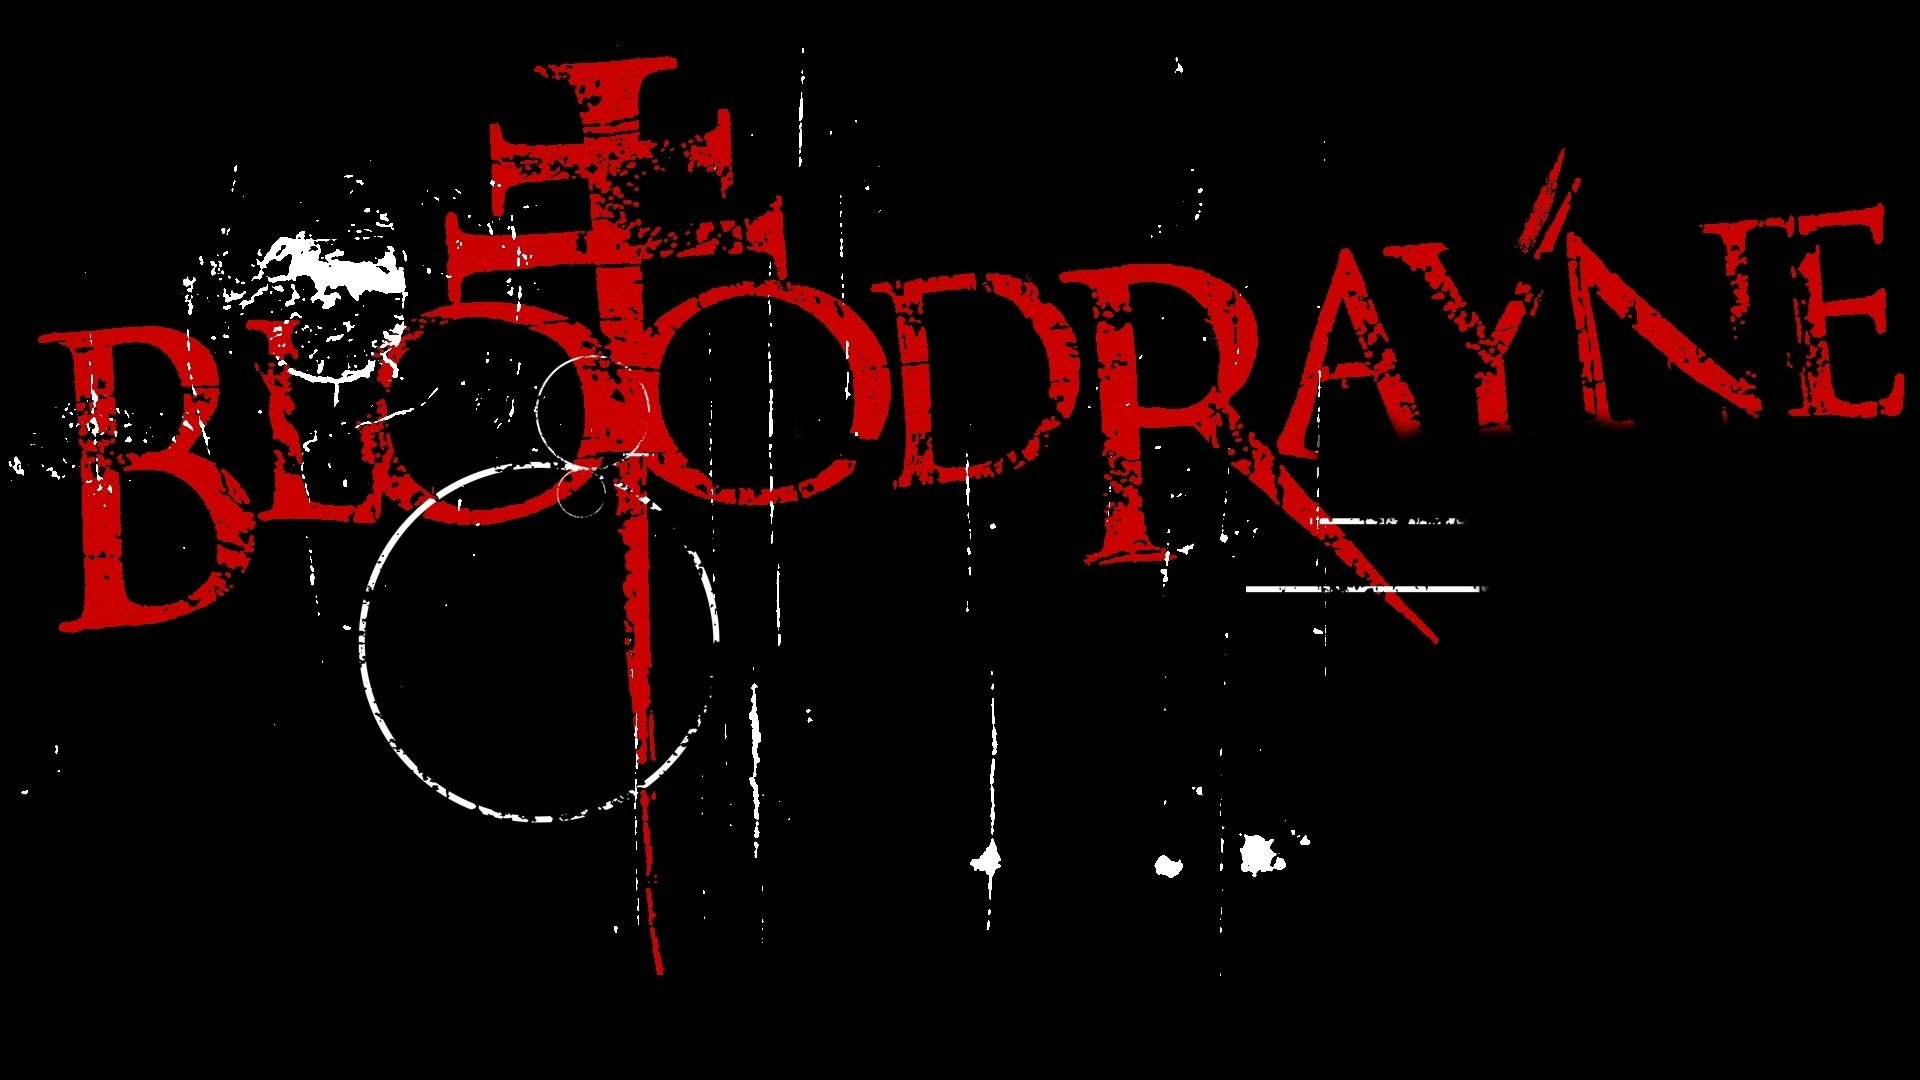 bloodrayne wallpaper 1920x1080 - photo #17